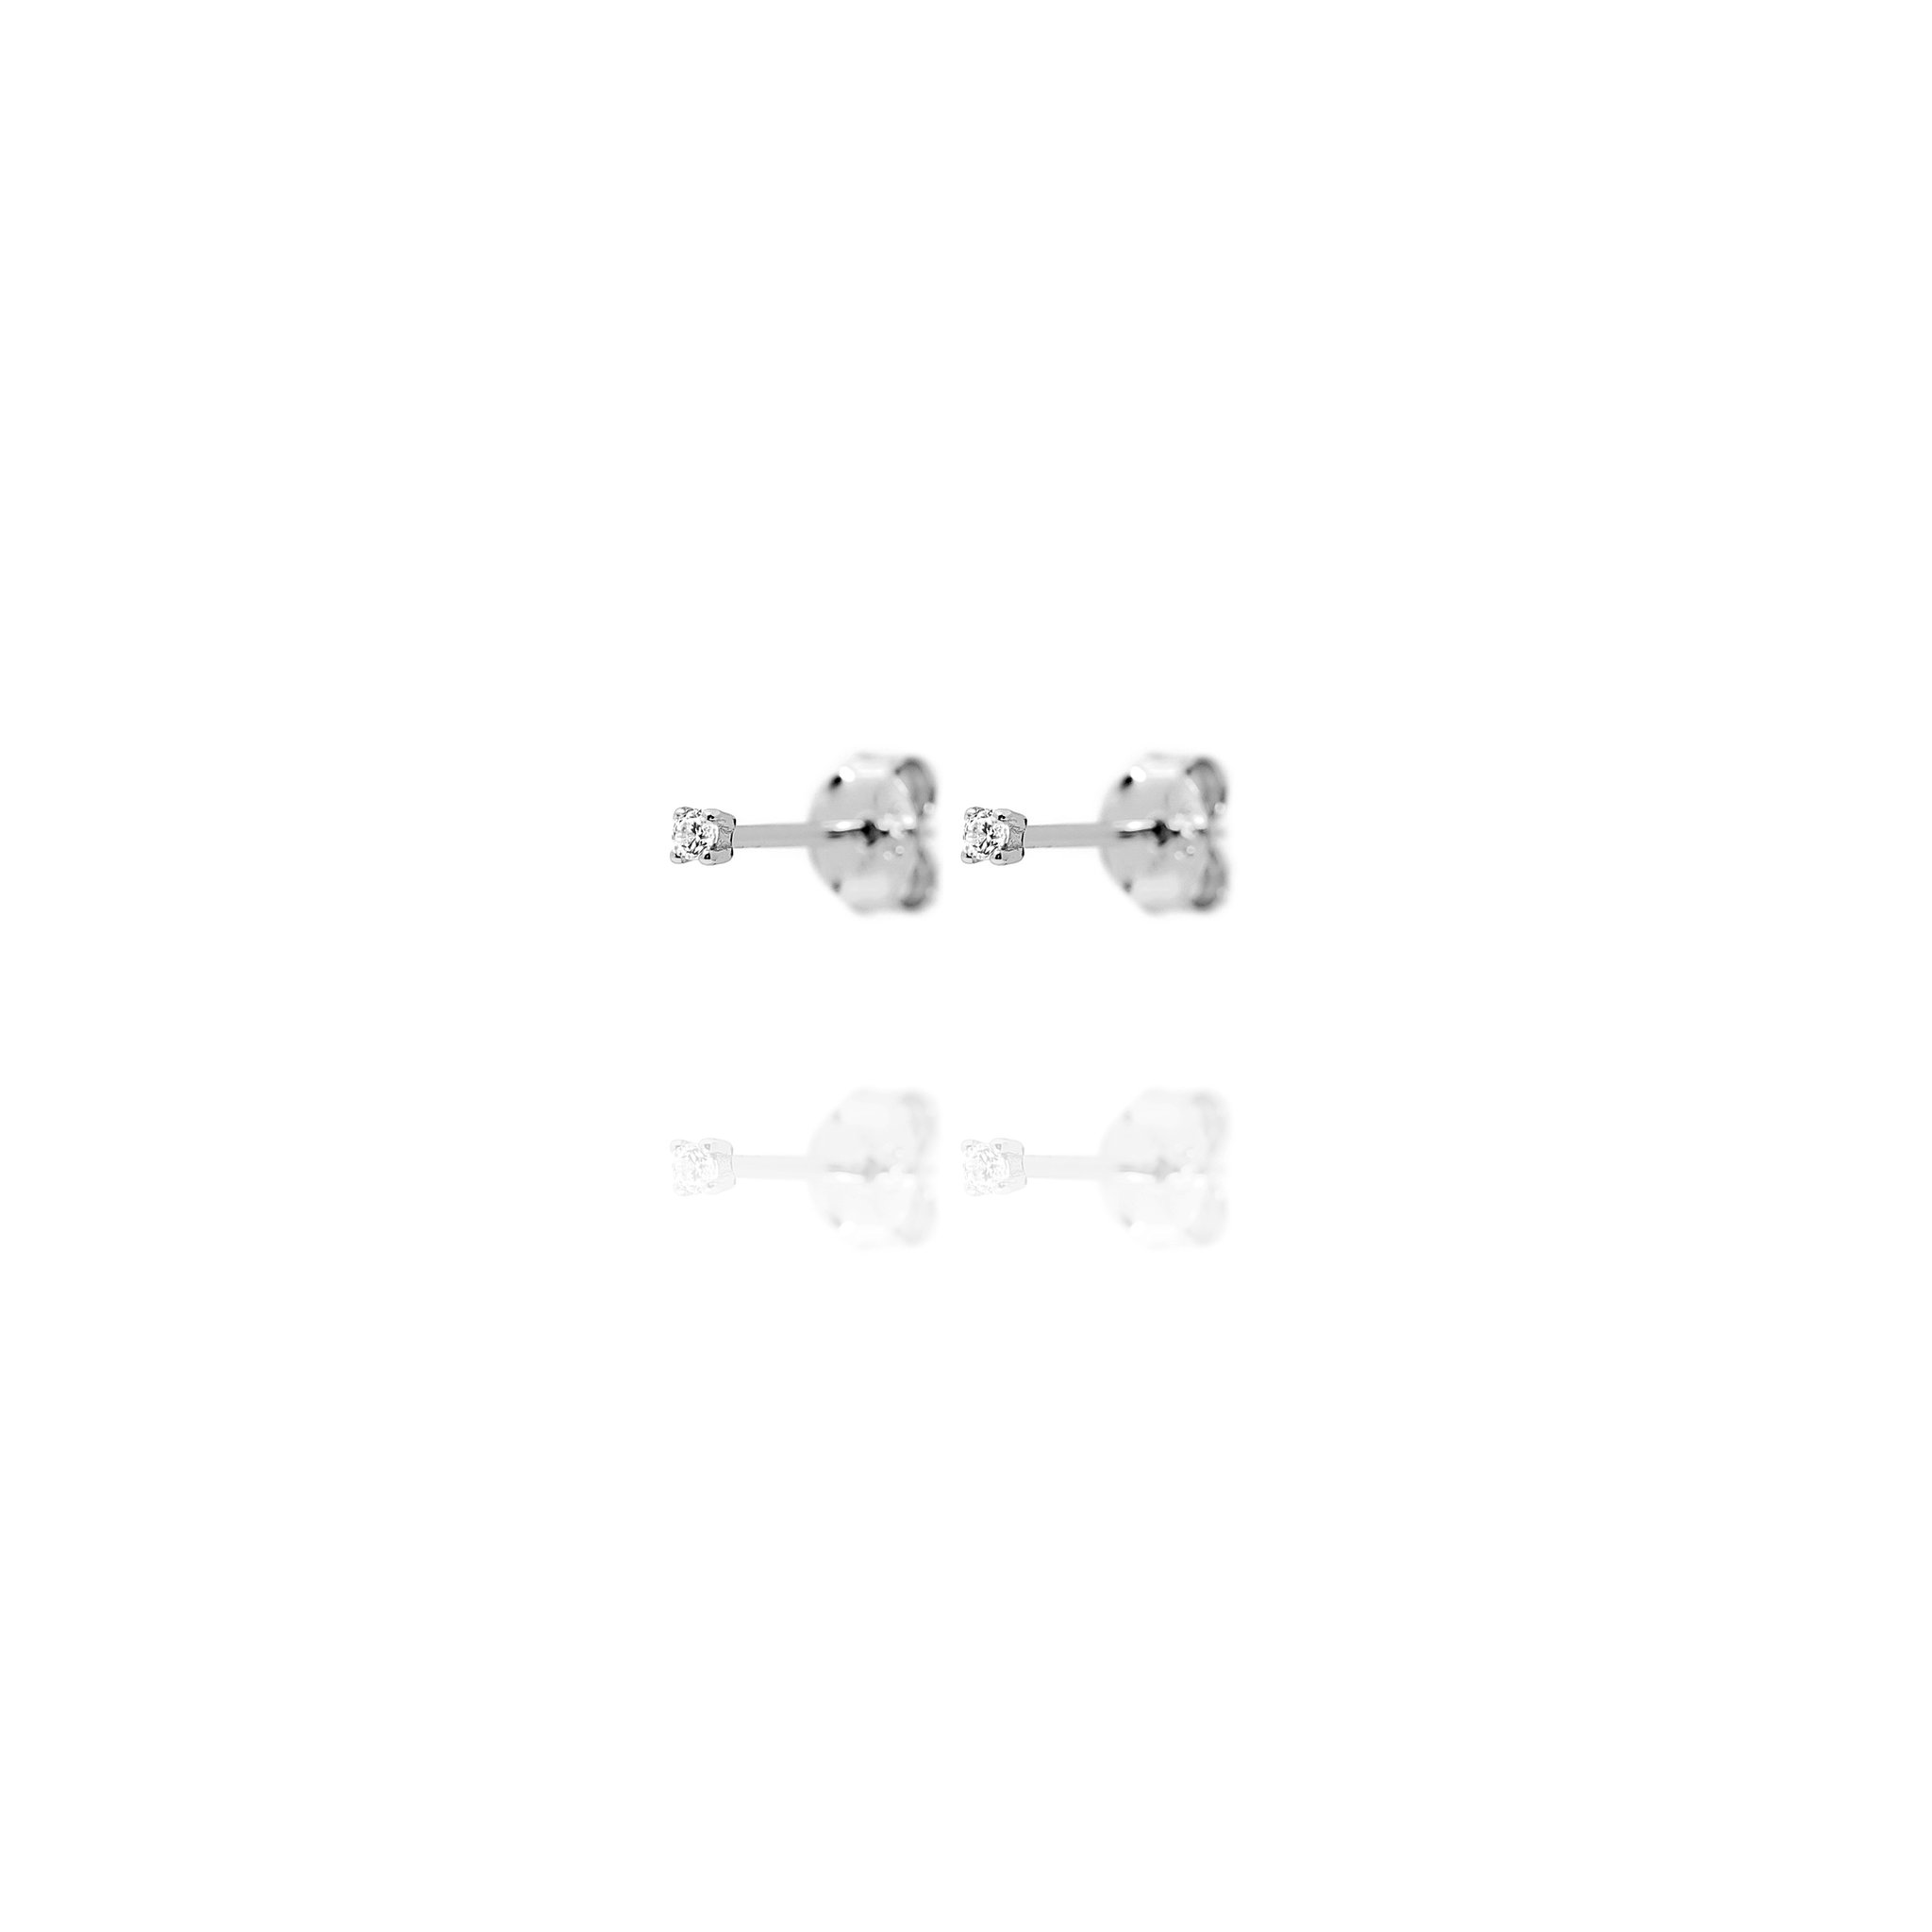 Stud Earrings Tiny Cubic Zirconia - Sterling Silver EG-5/S